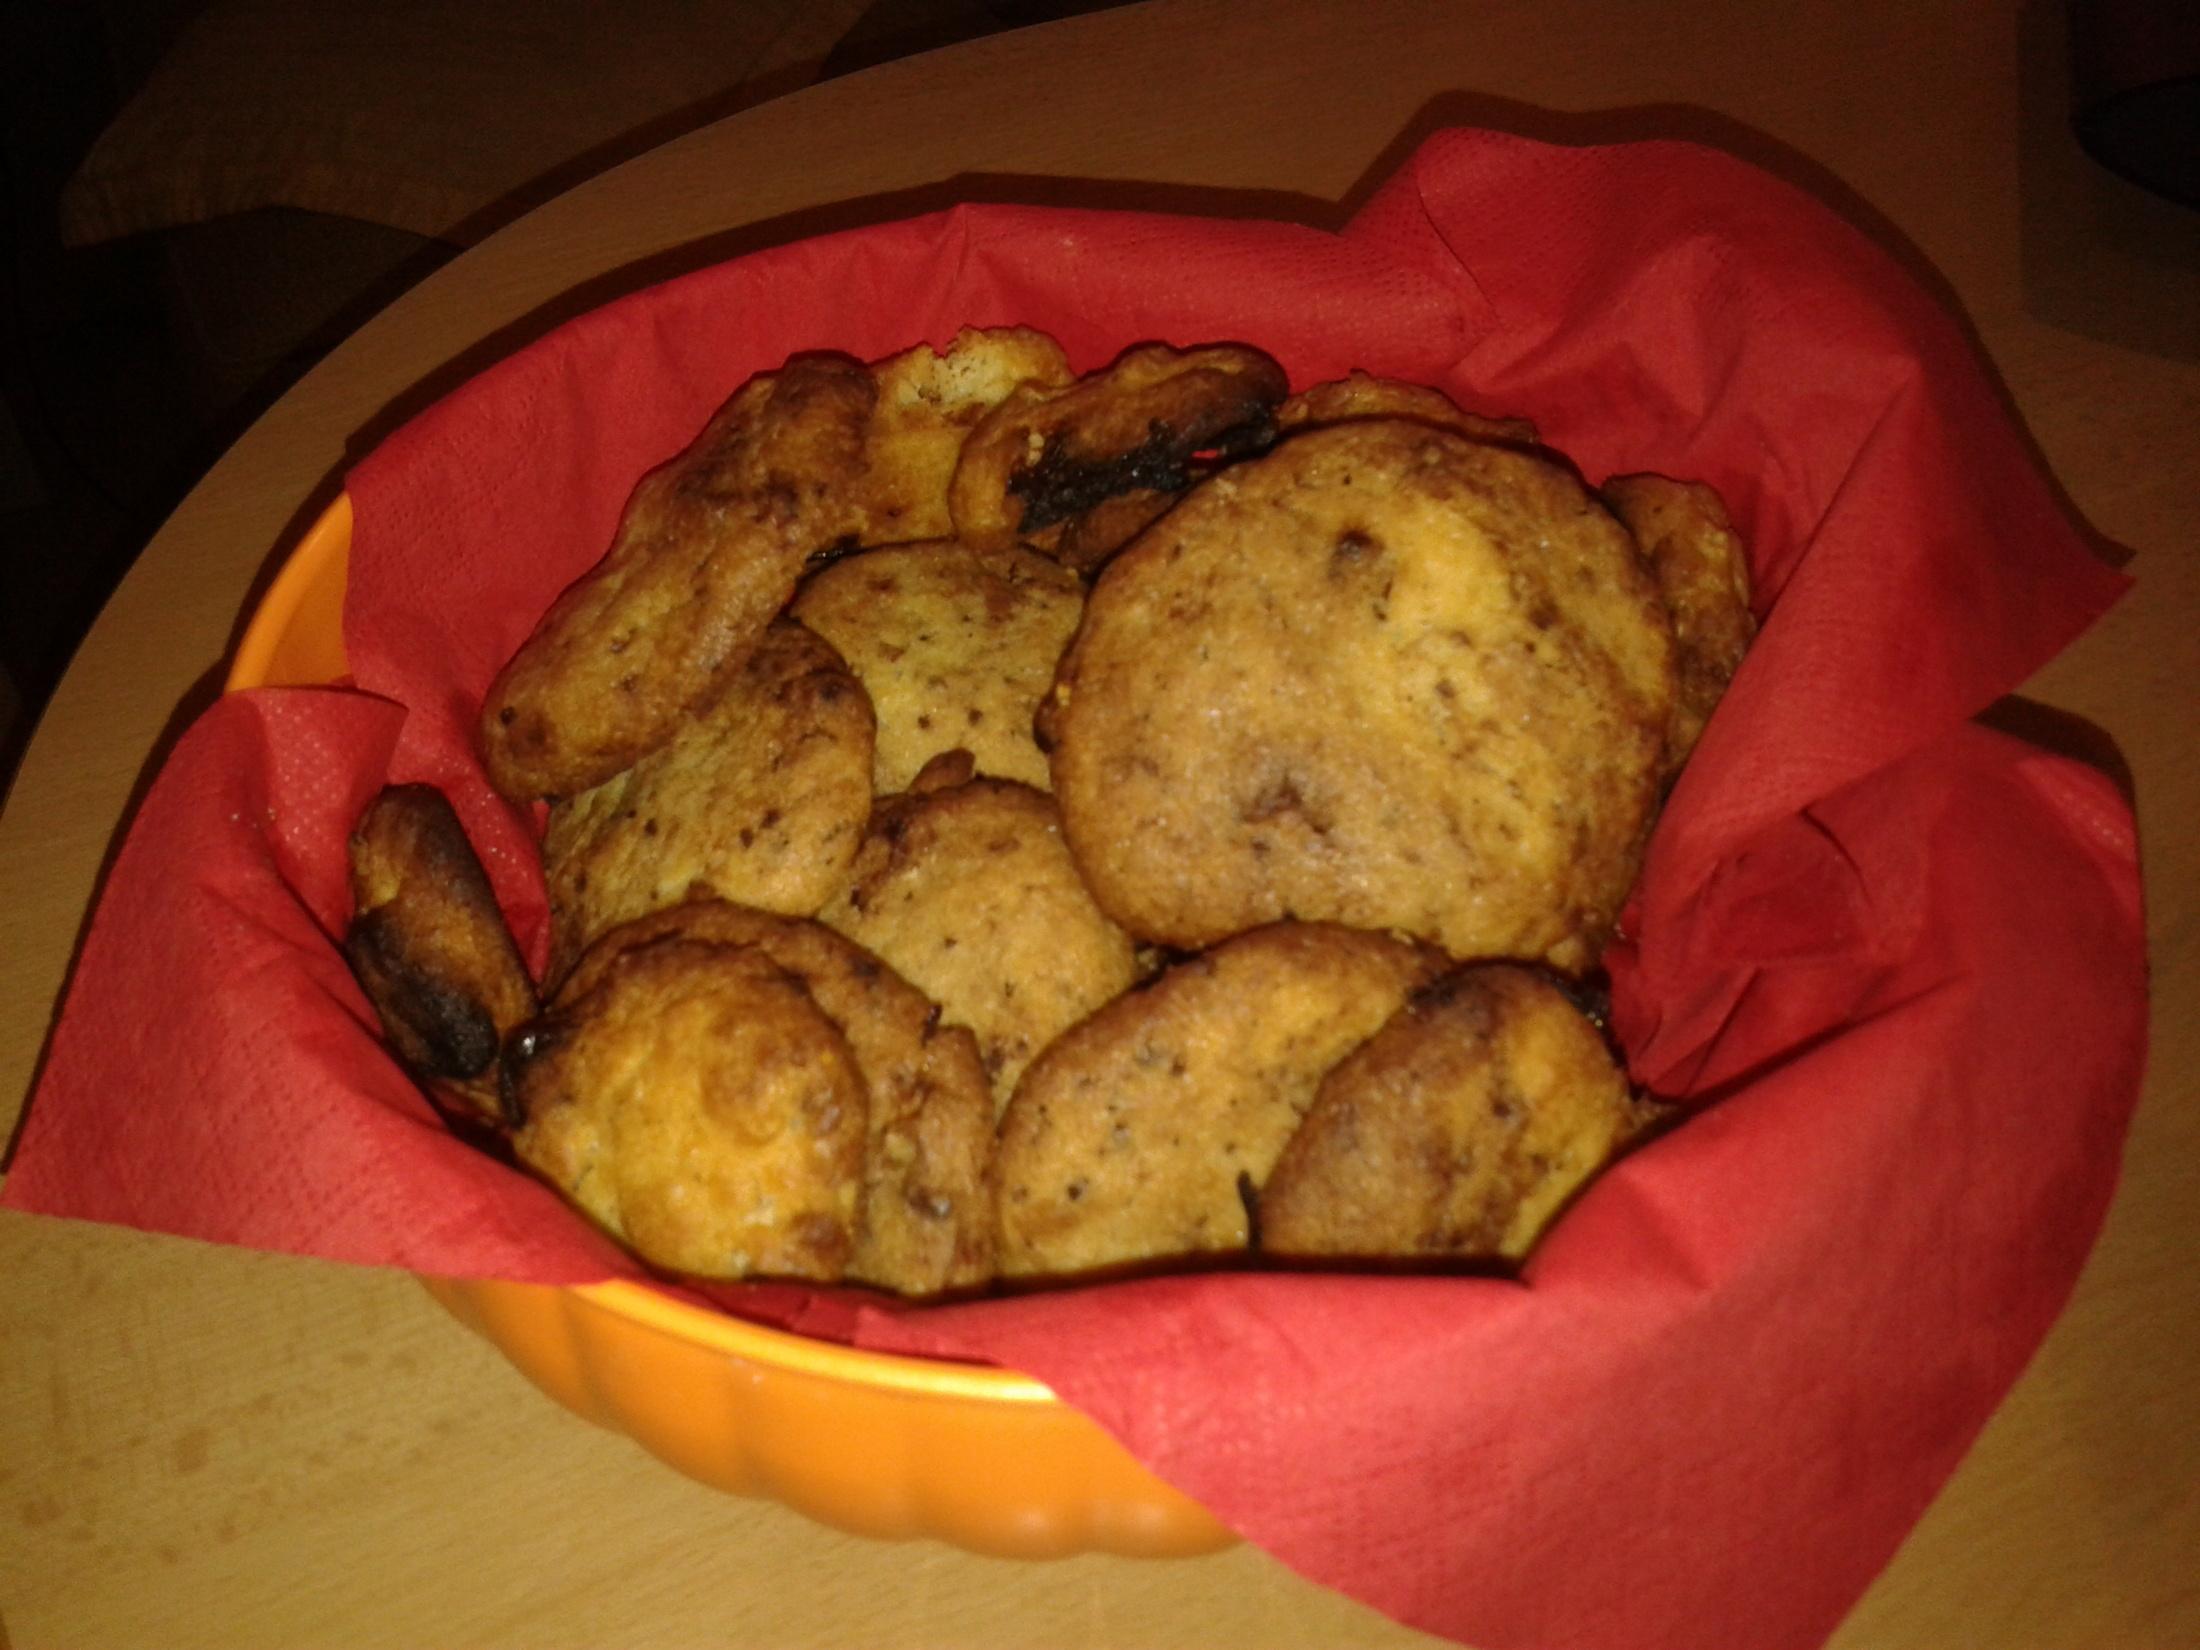 Recept Americké čokoládové cookies - Americké čokoládové cookies